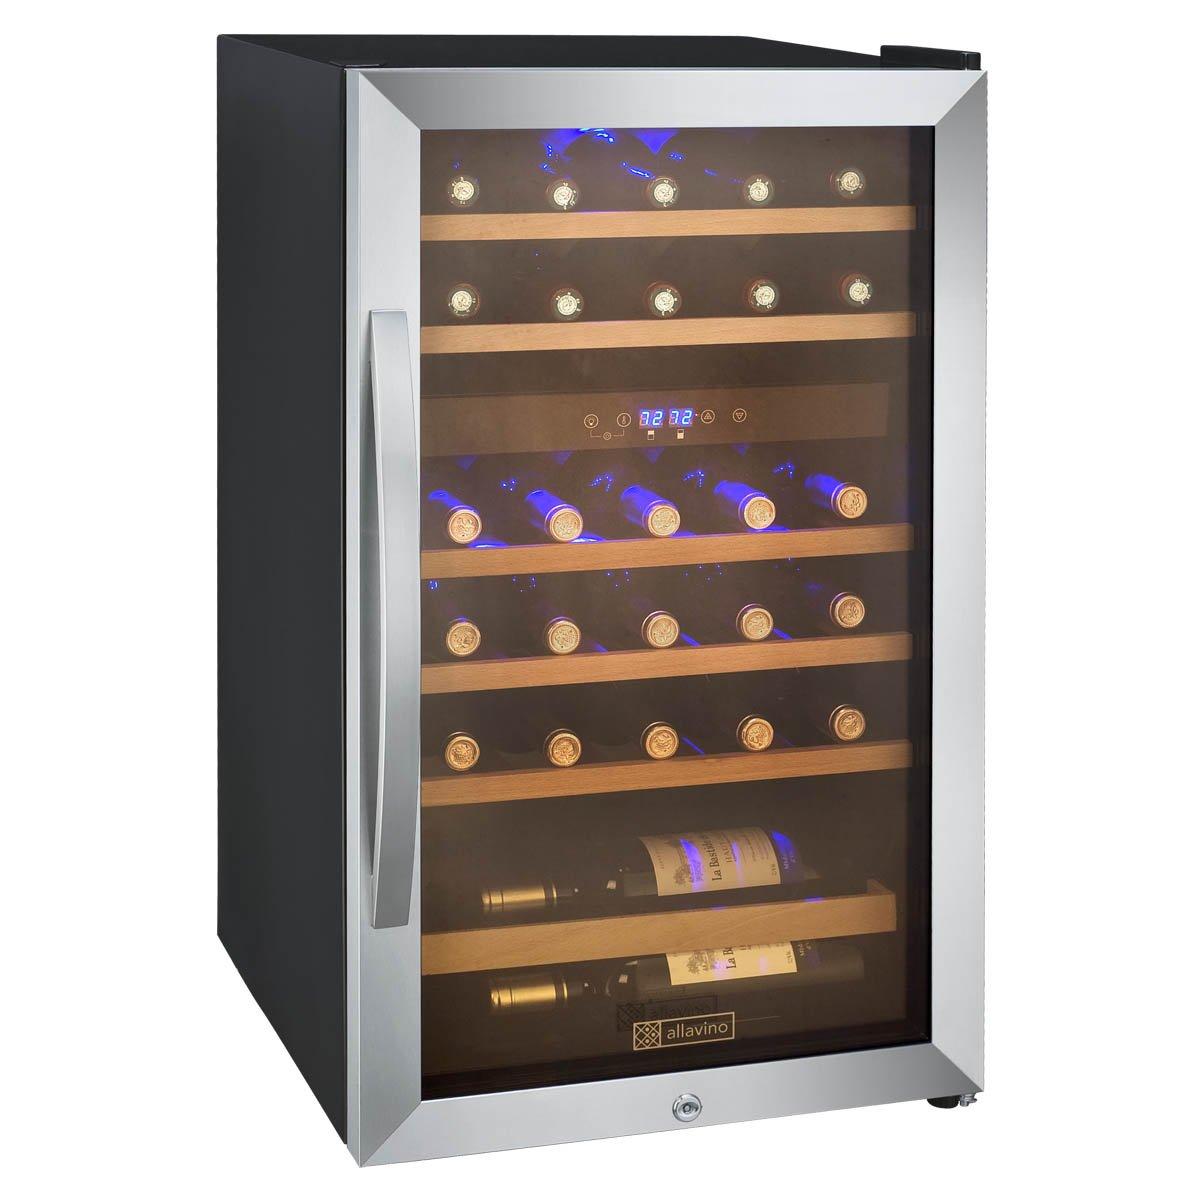 amazoncom allavino cdwr292swt cascina series 29 bottle dual zone wine appliances